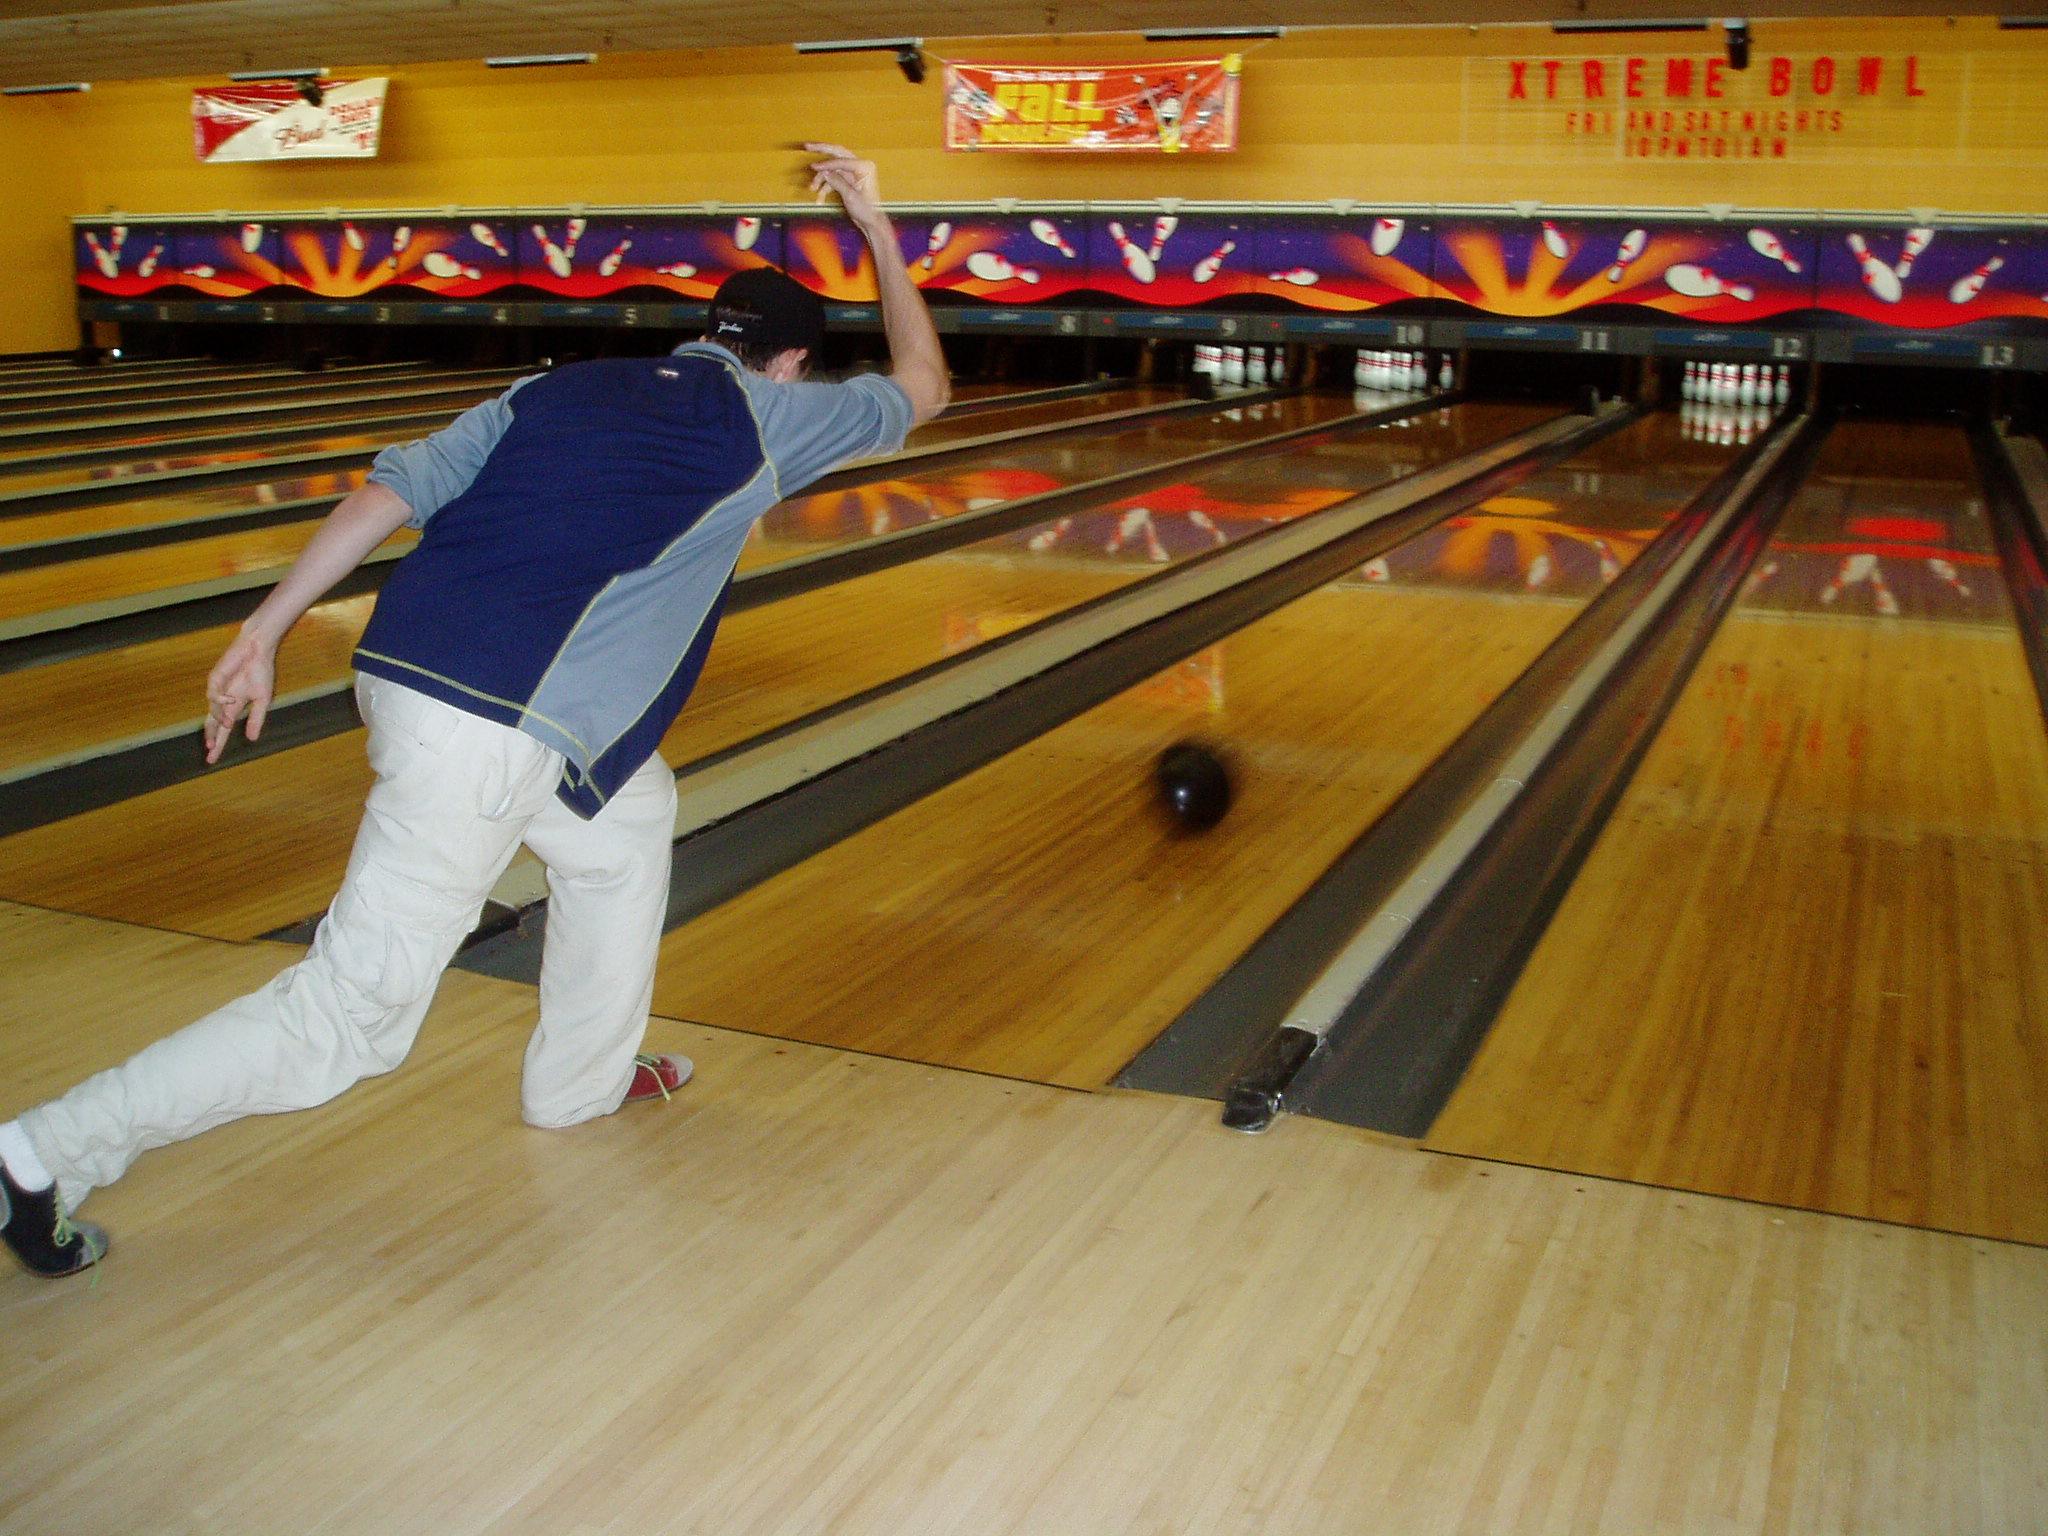 300 bowling